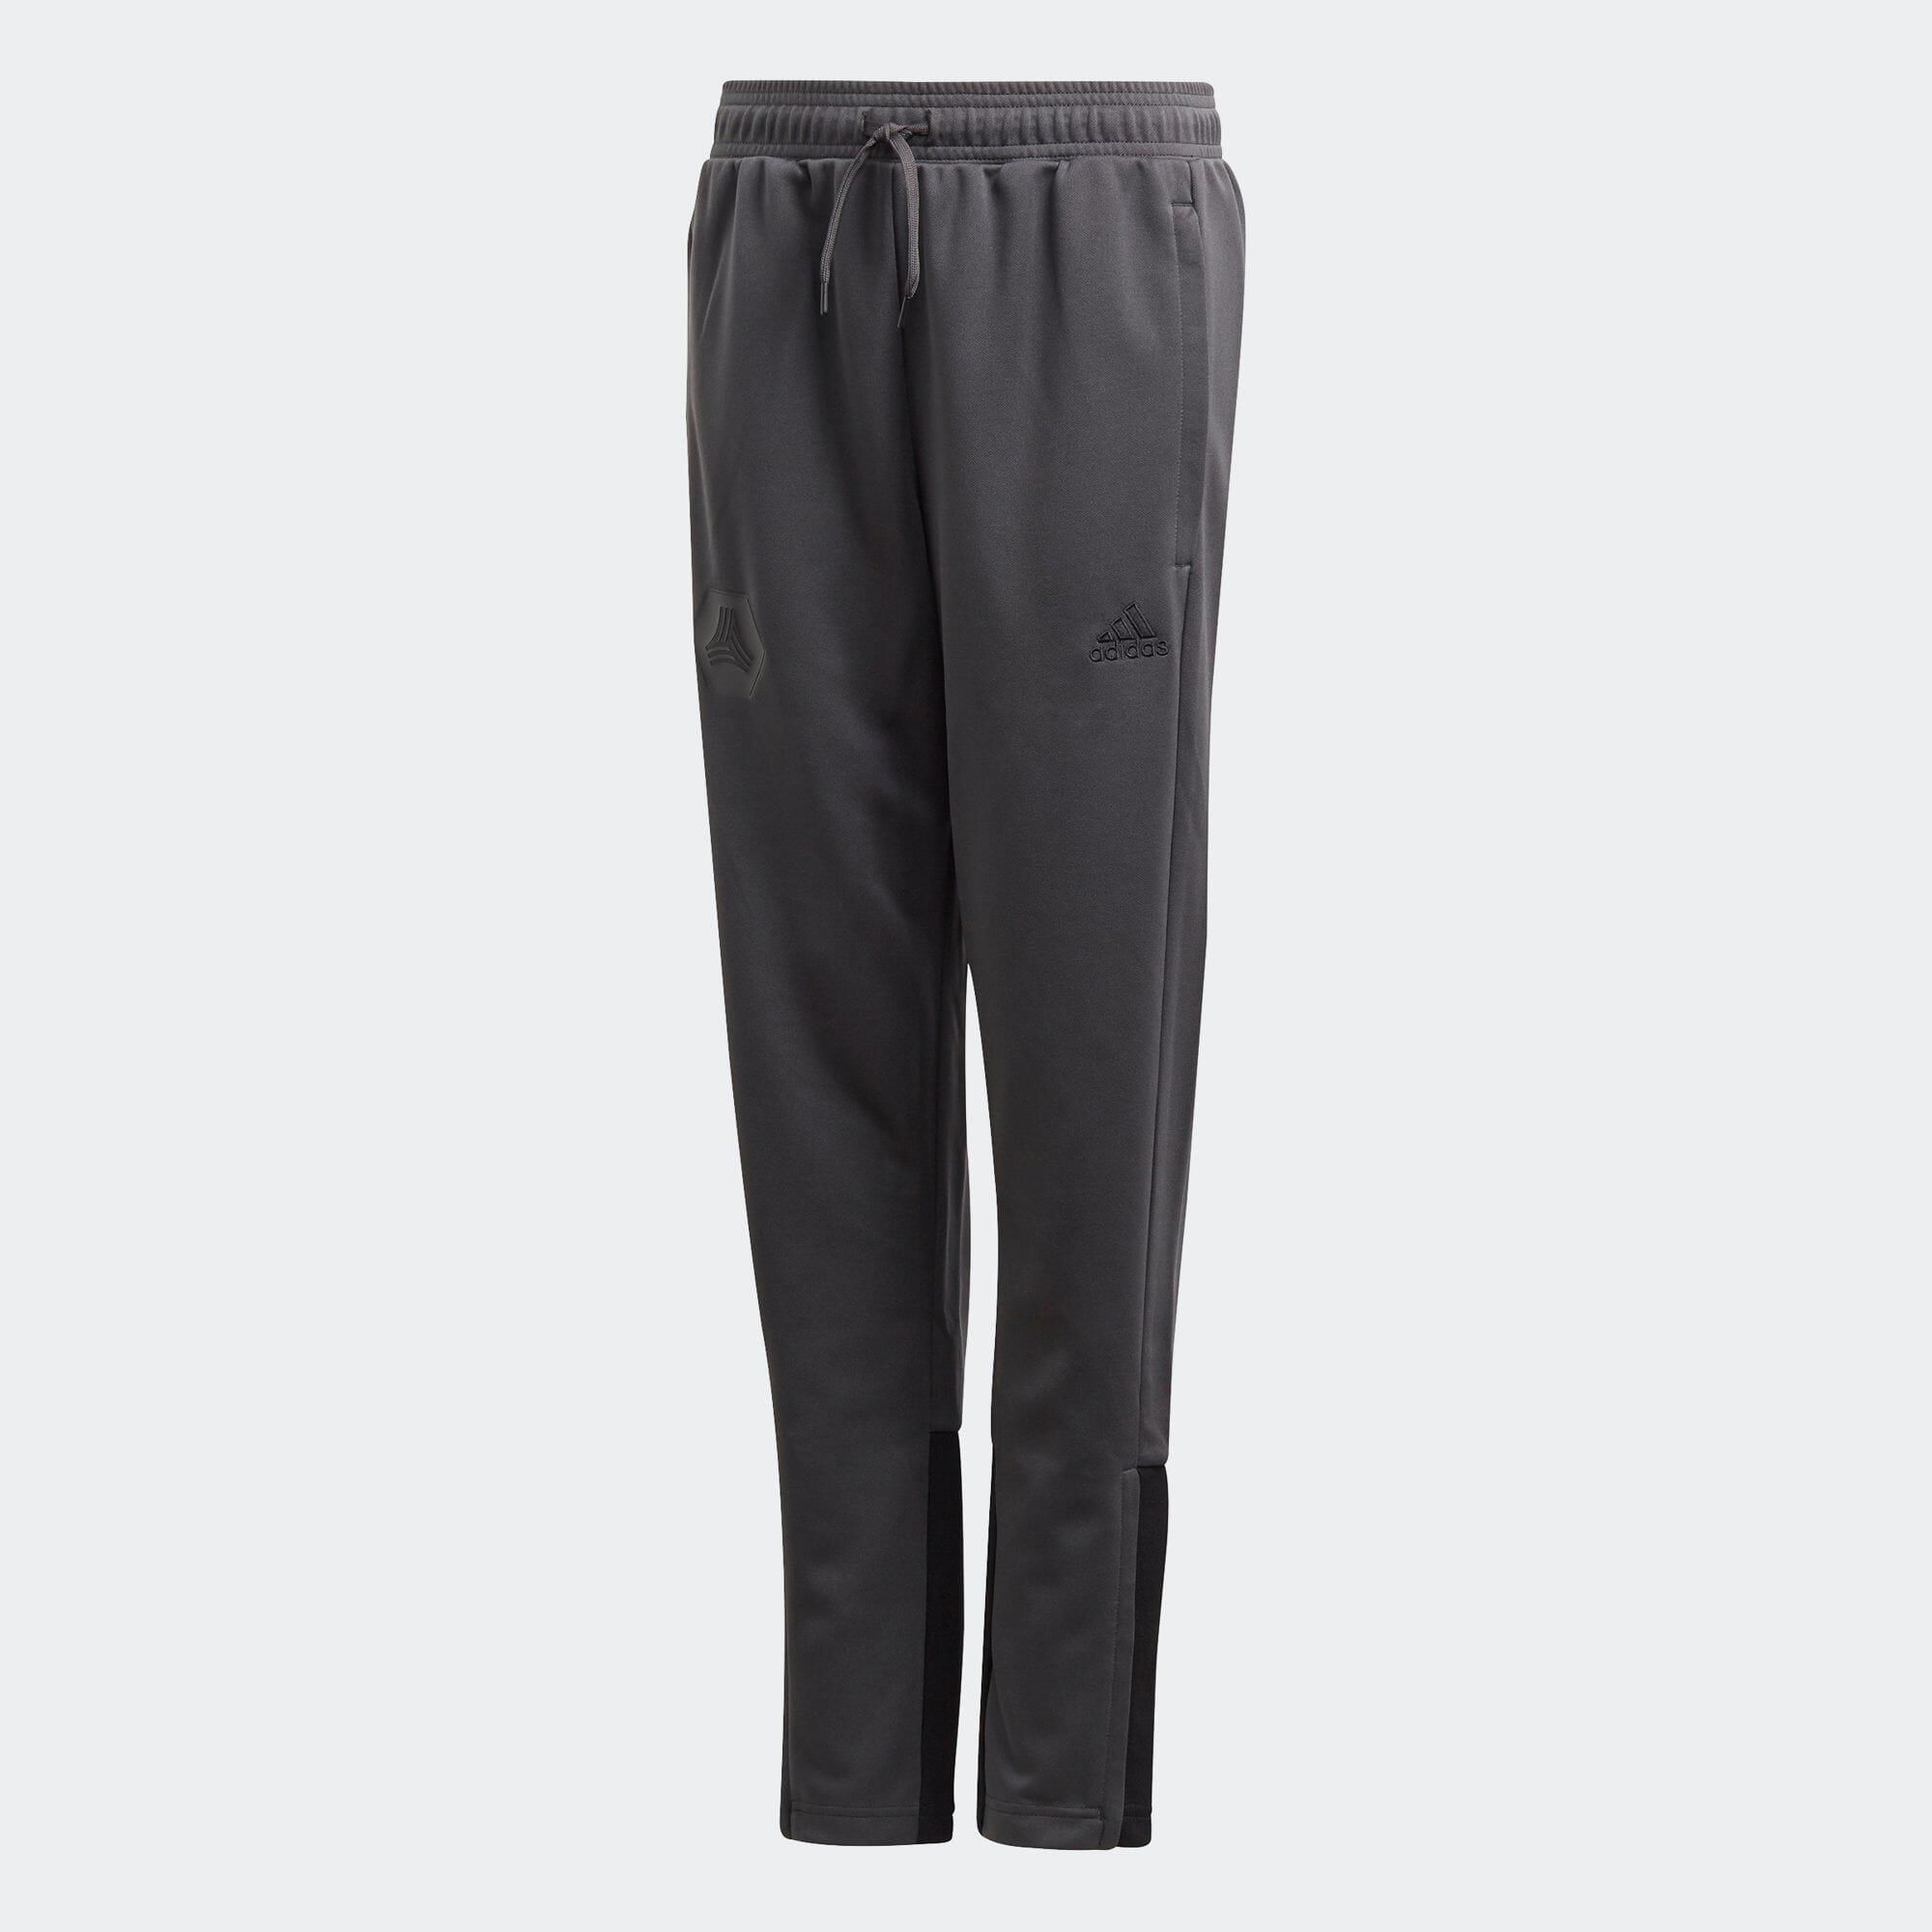 TANGO トレーニング パンツ / TANGO Training Pants